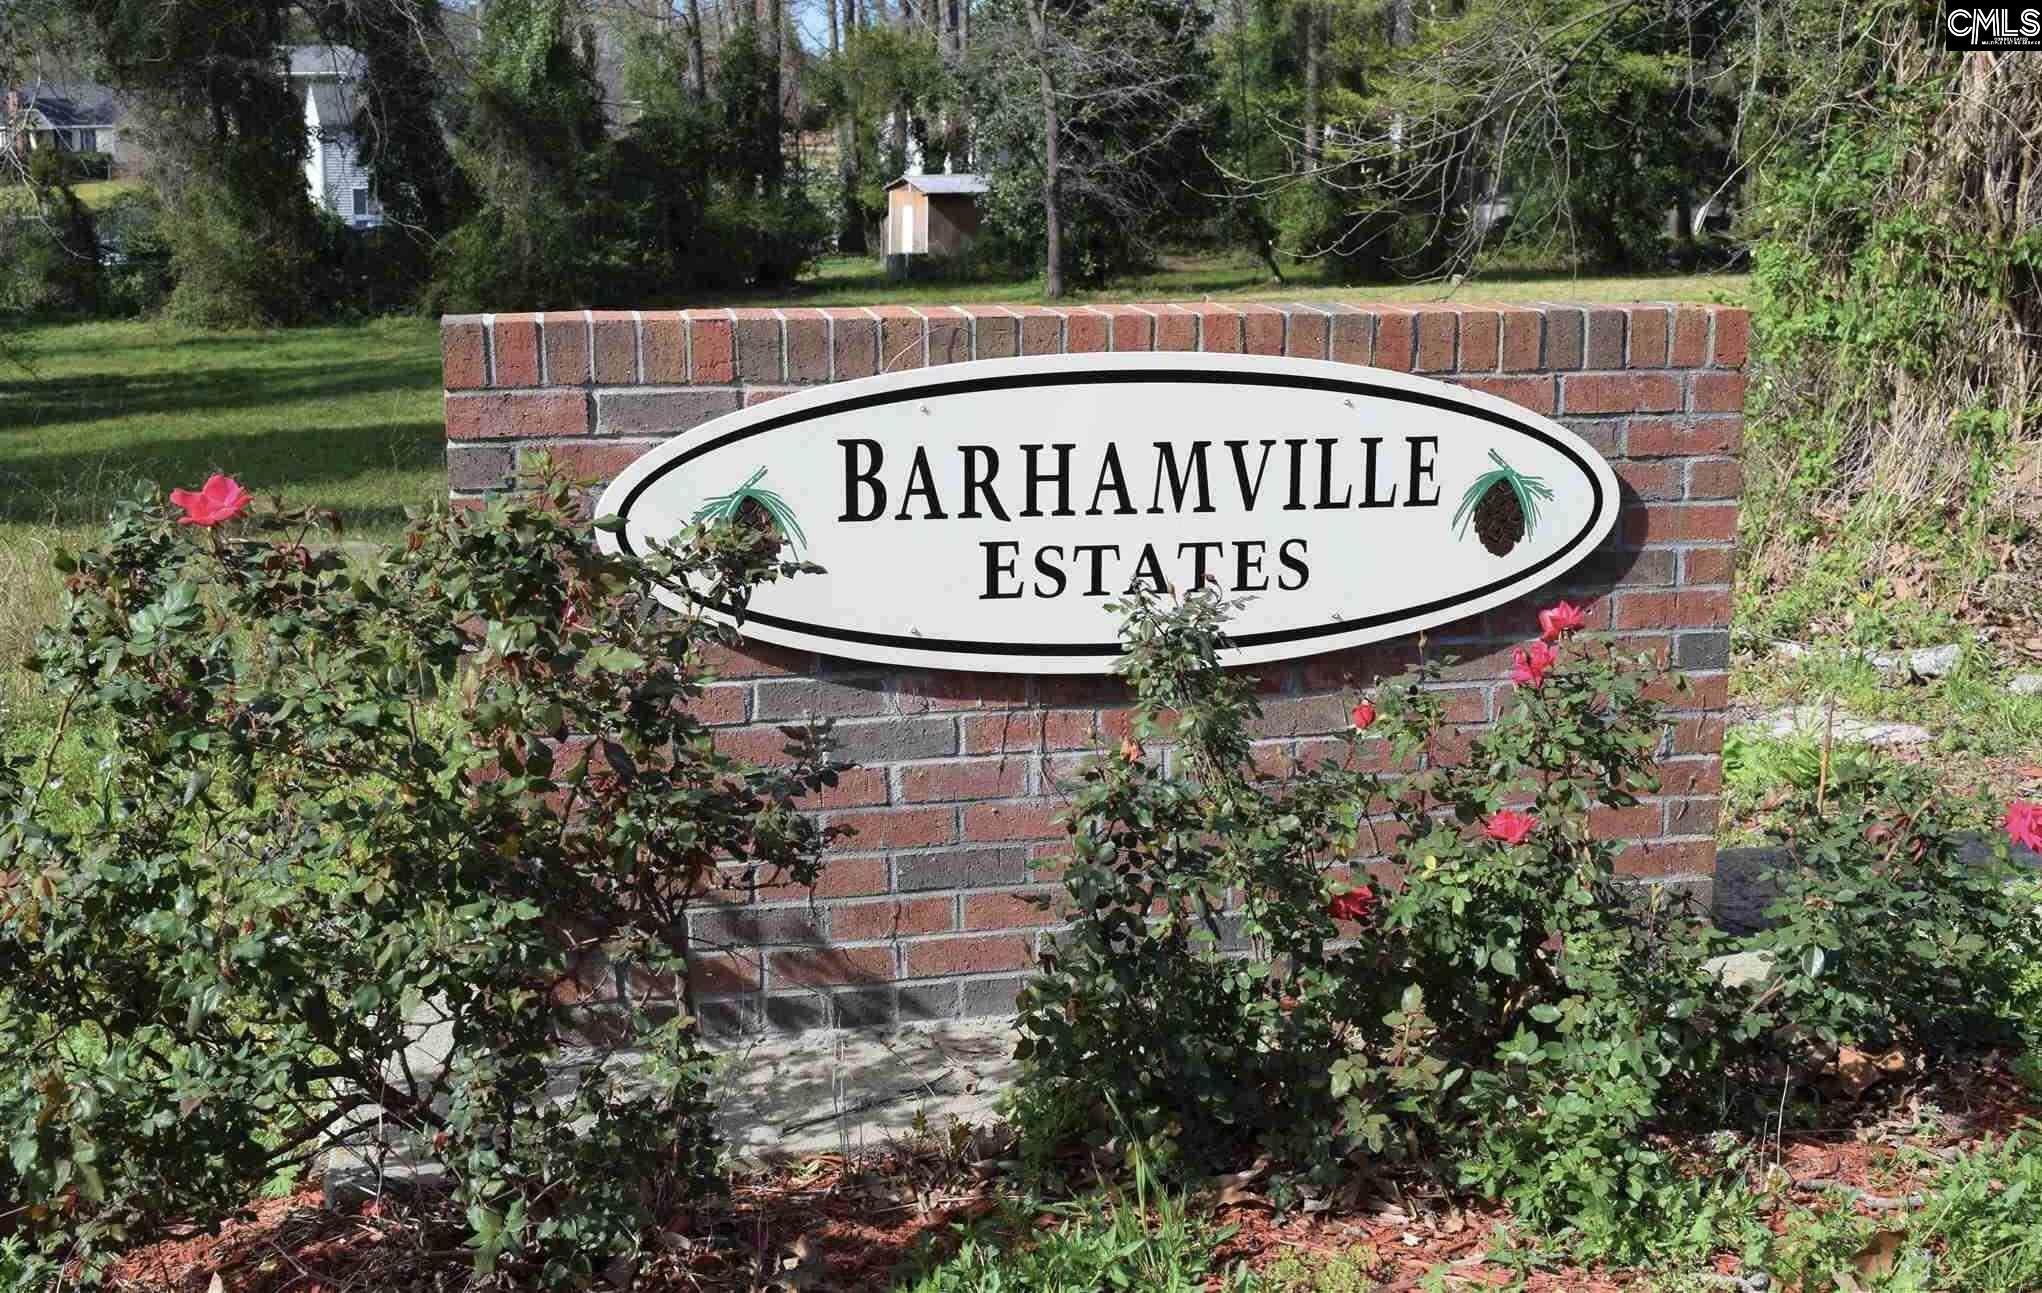 Barhamville #1 Columbia, SC 29204